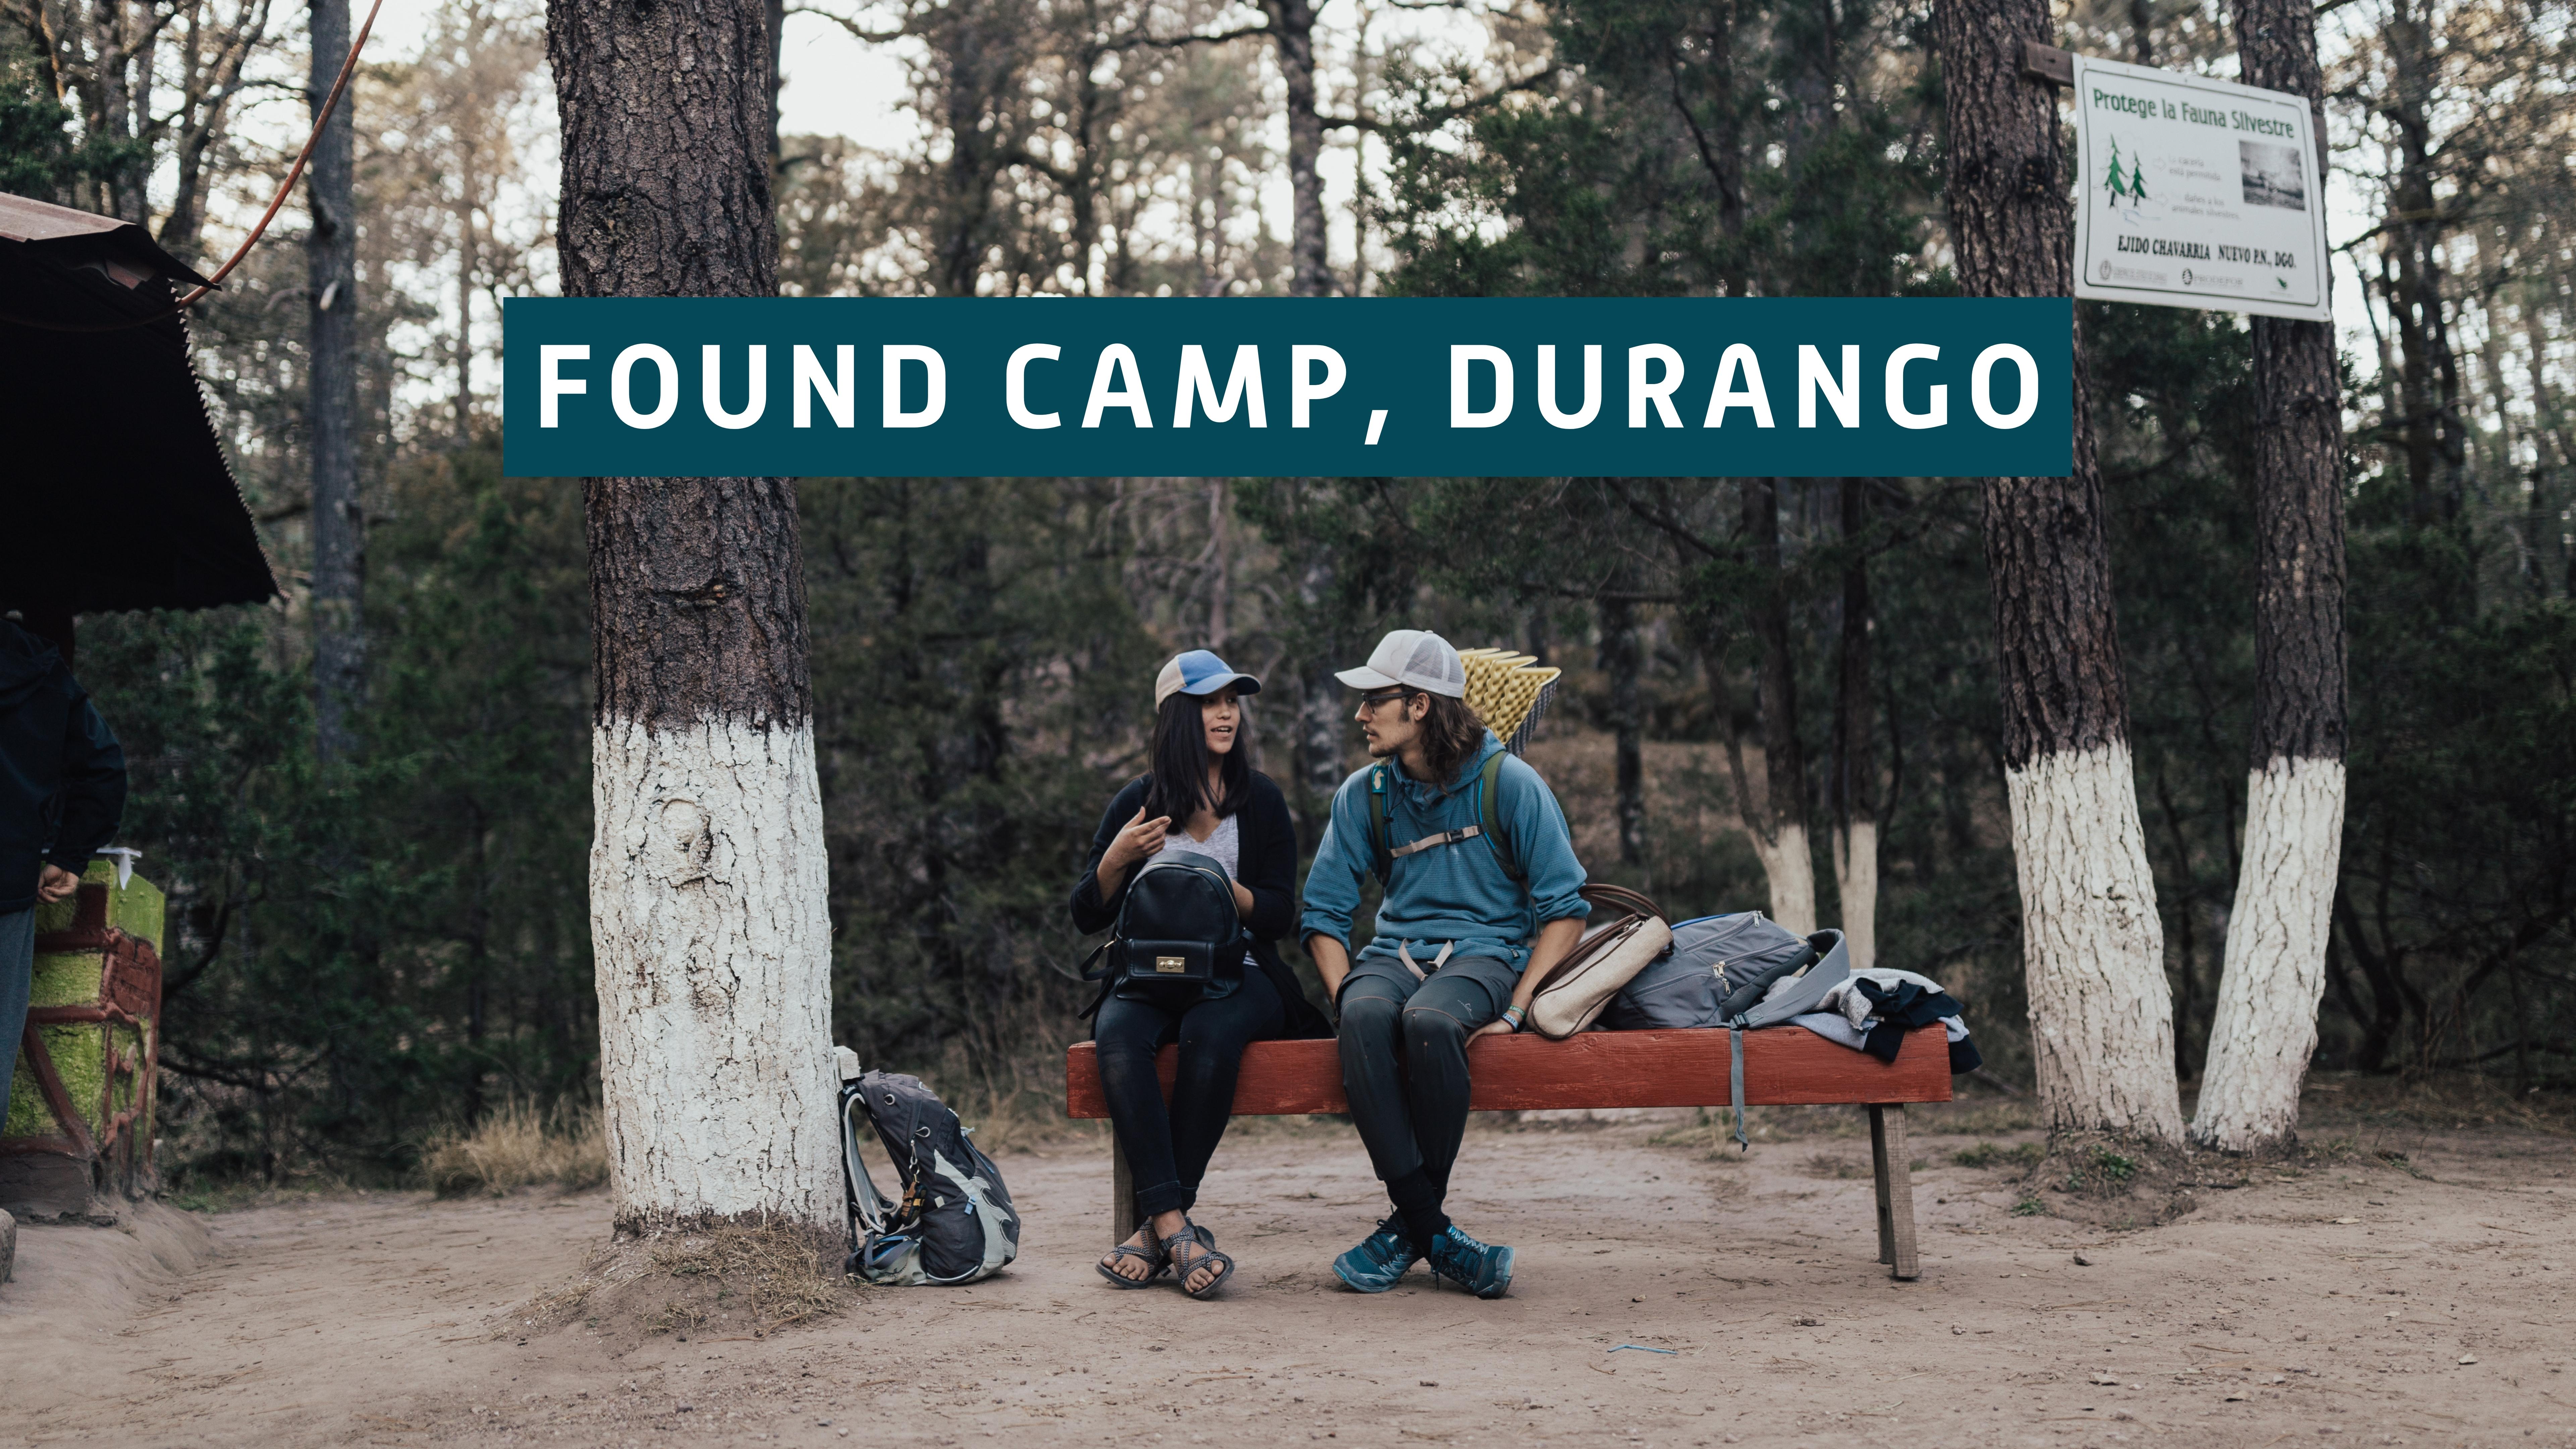 Found Camp - Durango